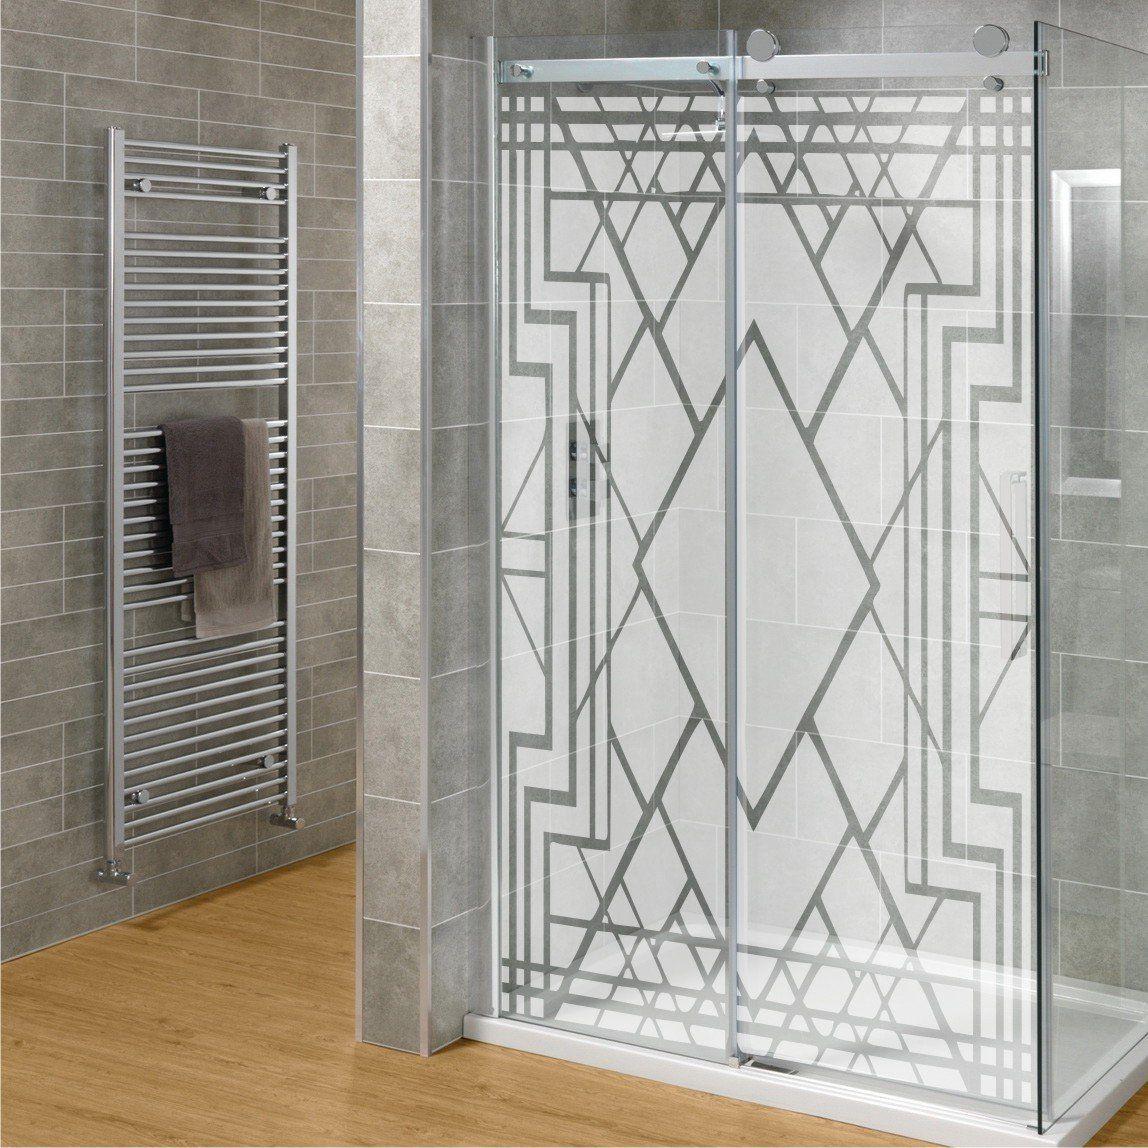 Diy Etched Glass Shower Door Set Art Deco Design By Miss Decal Inc